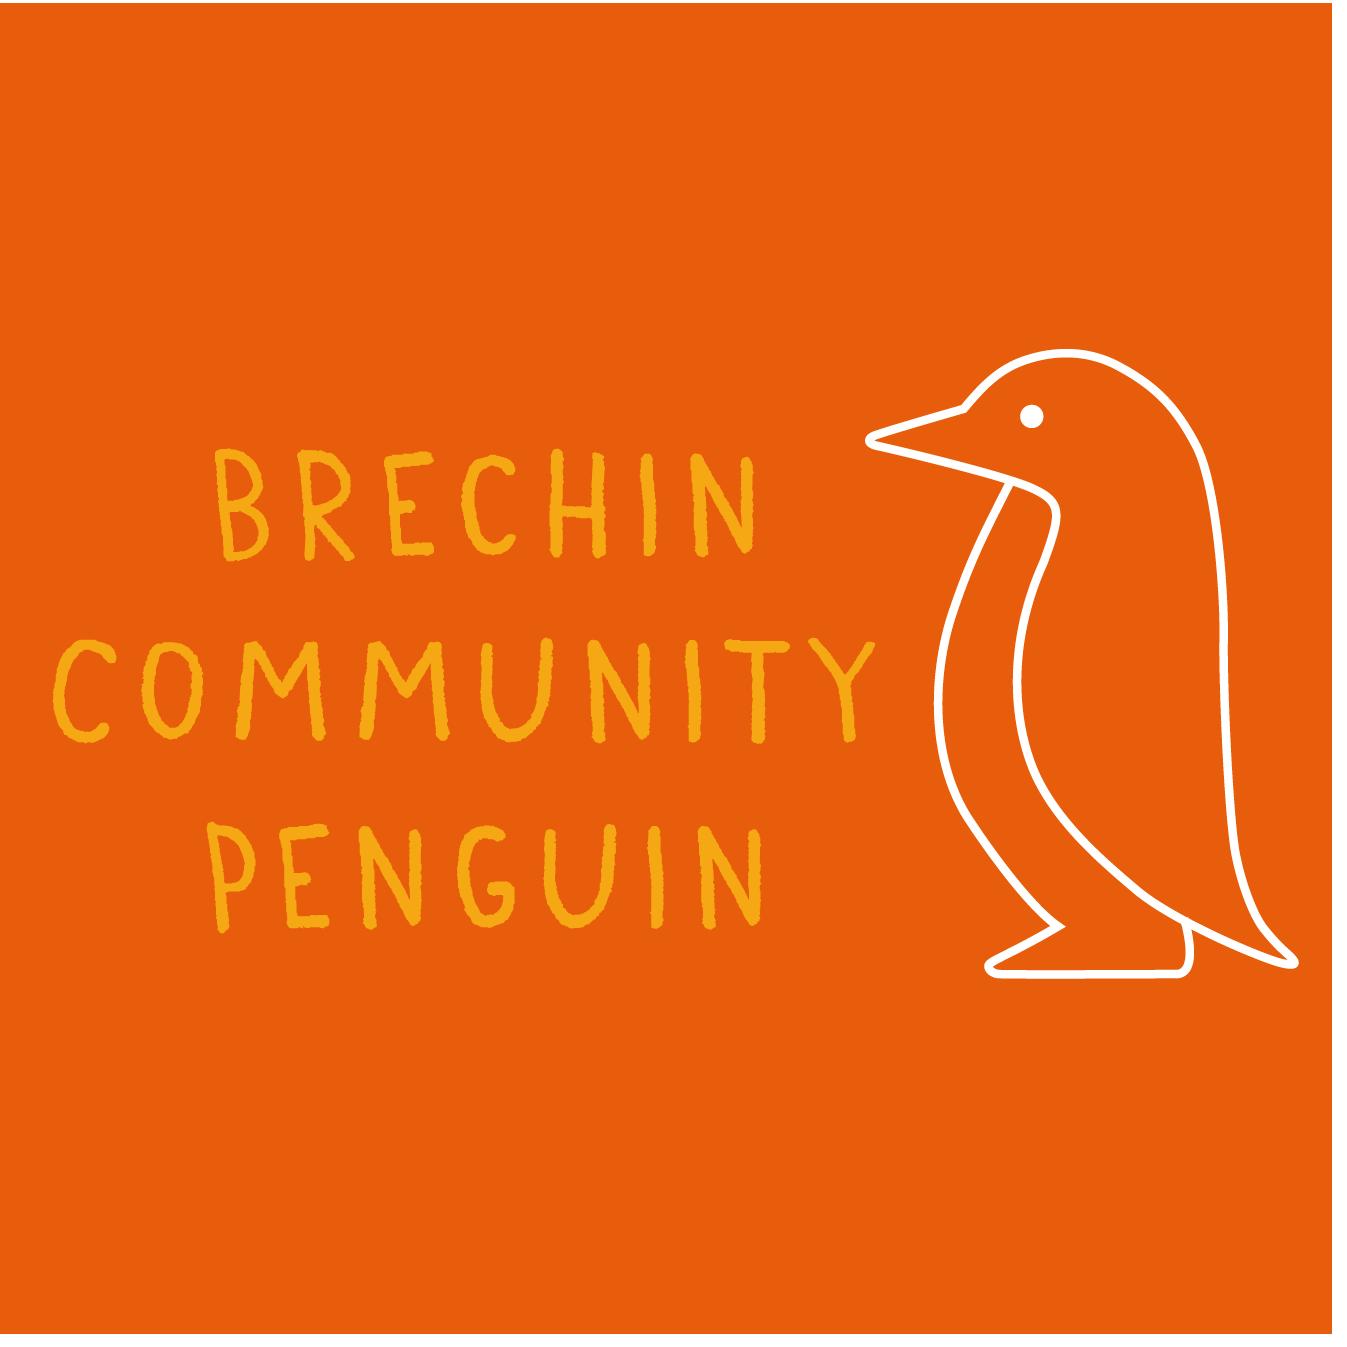 Brechin Community